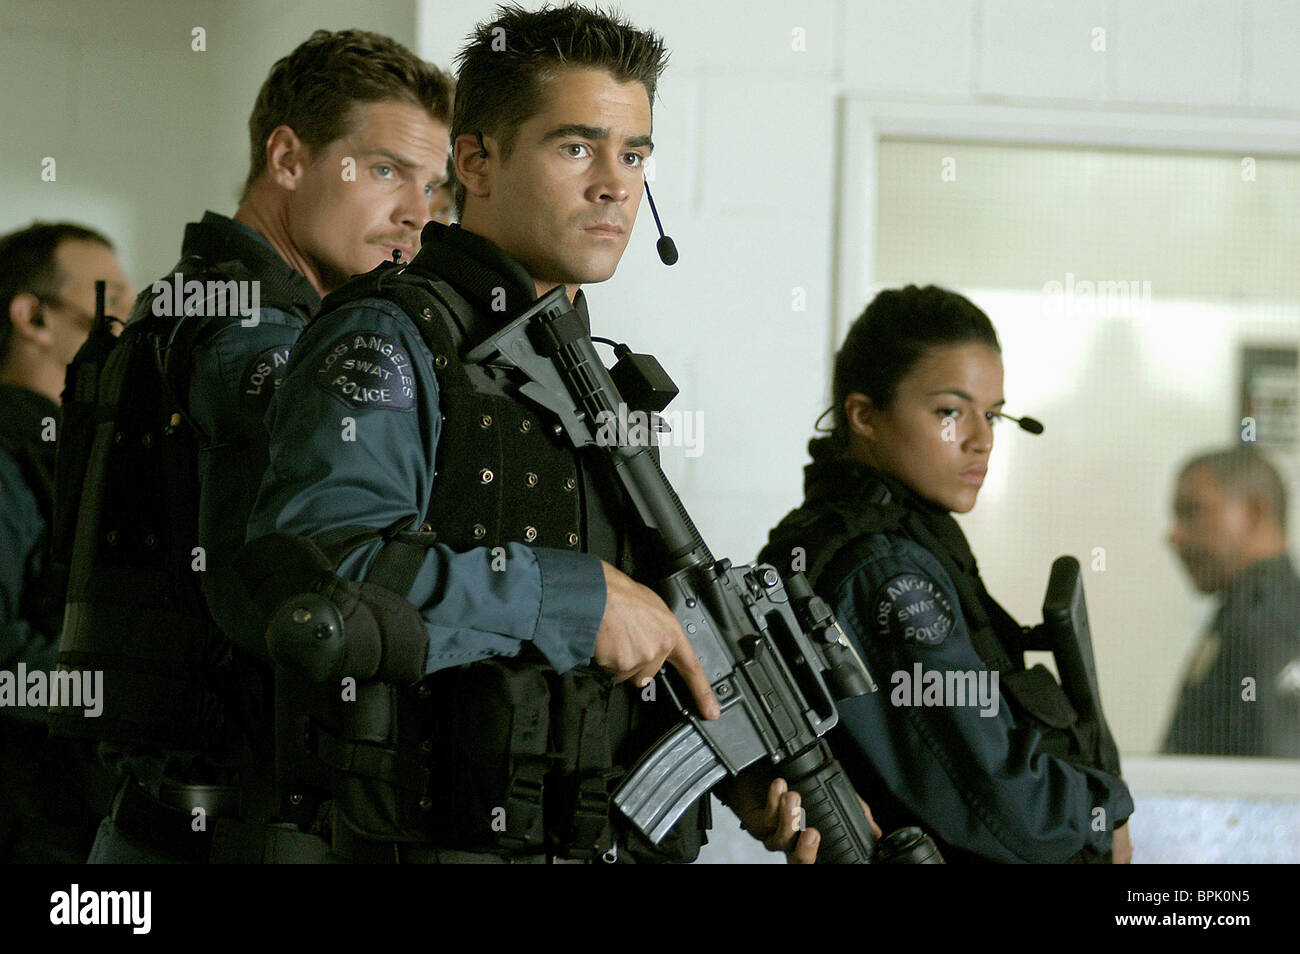 BRIAN VAN HOLT COLIN FARRELL & MICHELLE RODRIGUEZ S.W.A.T.; SWAT (2003) - Stock Image